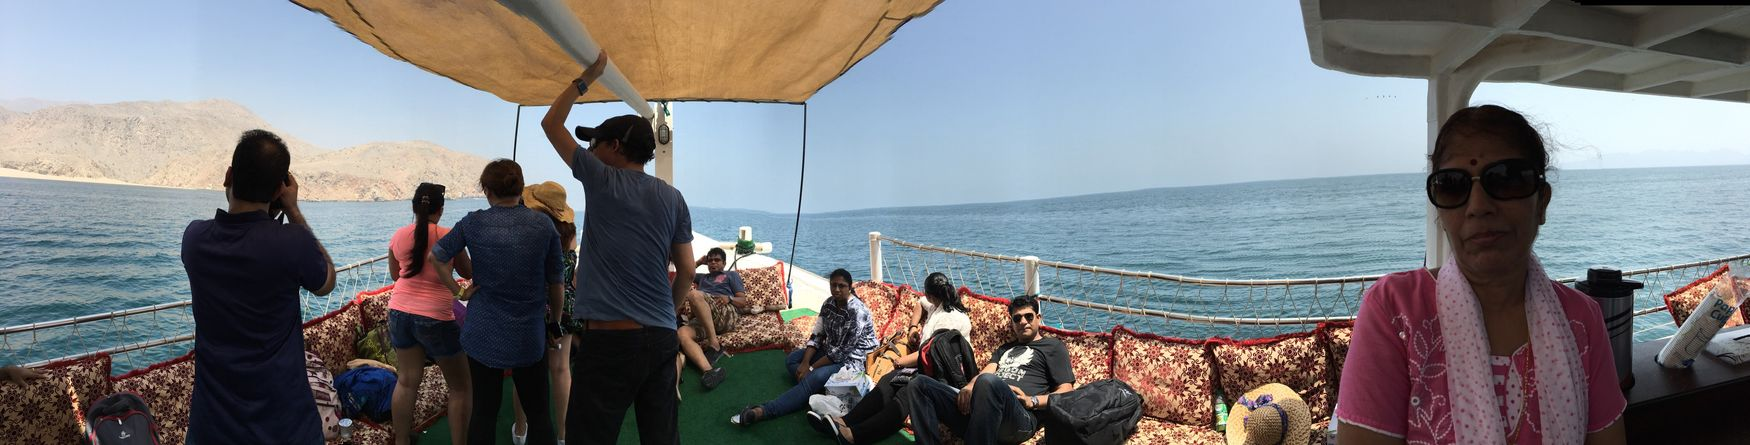 EyeEm Selects Oman Musandam Cruise Dhowcruise Blue Sky Blue Water Panoramic